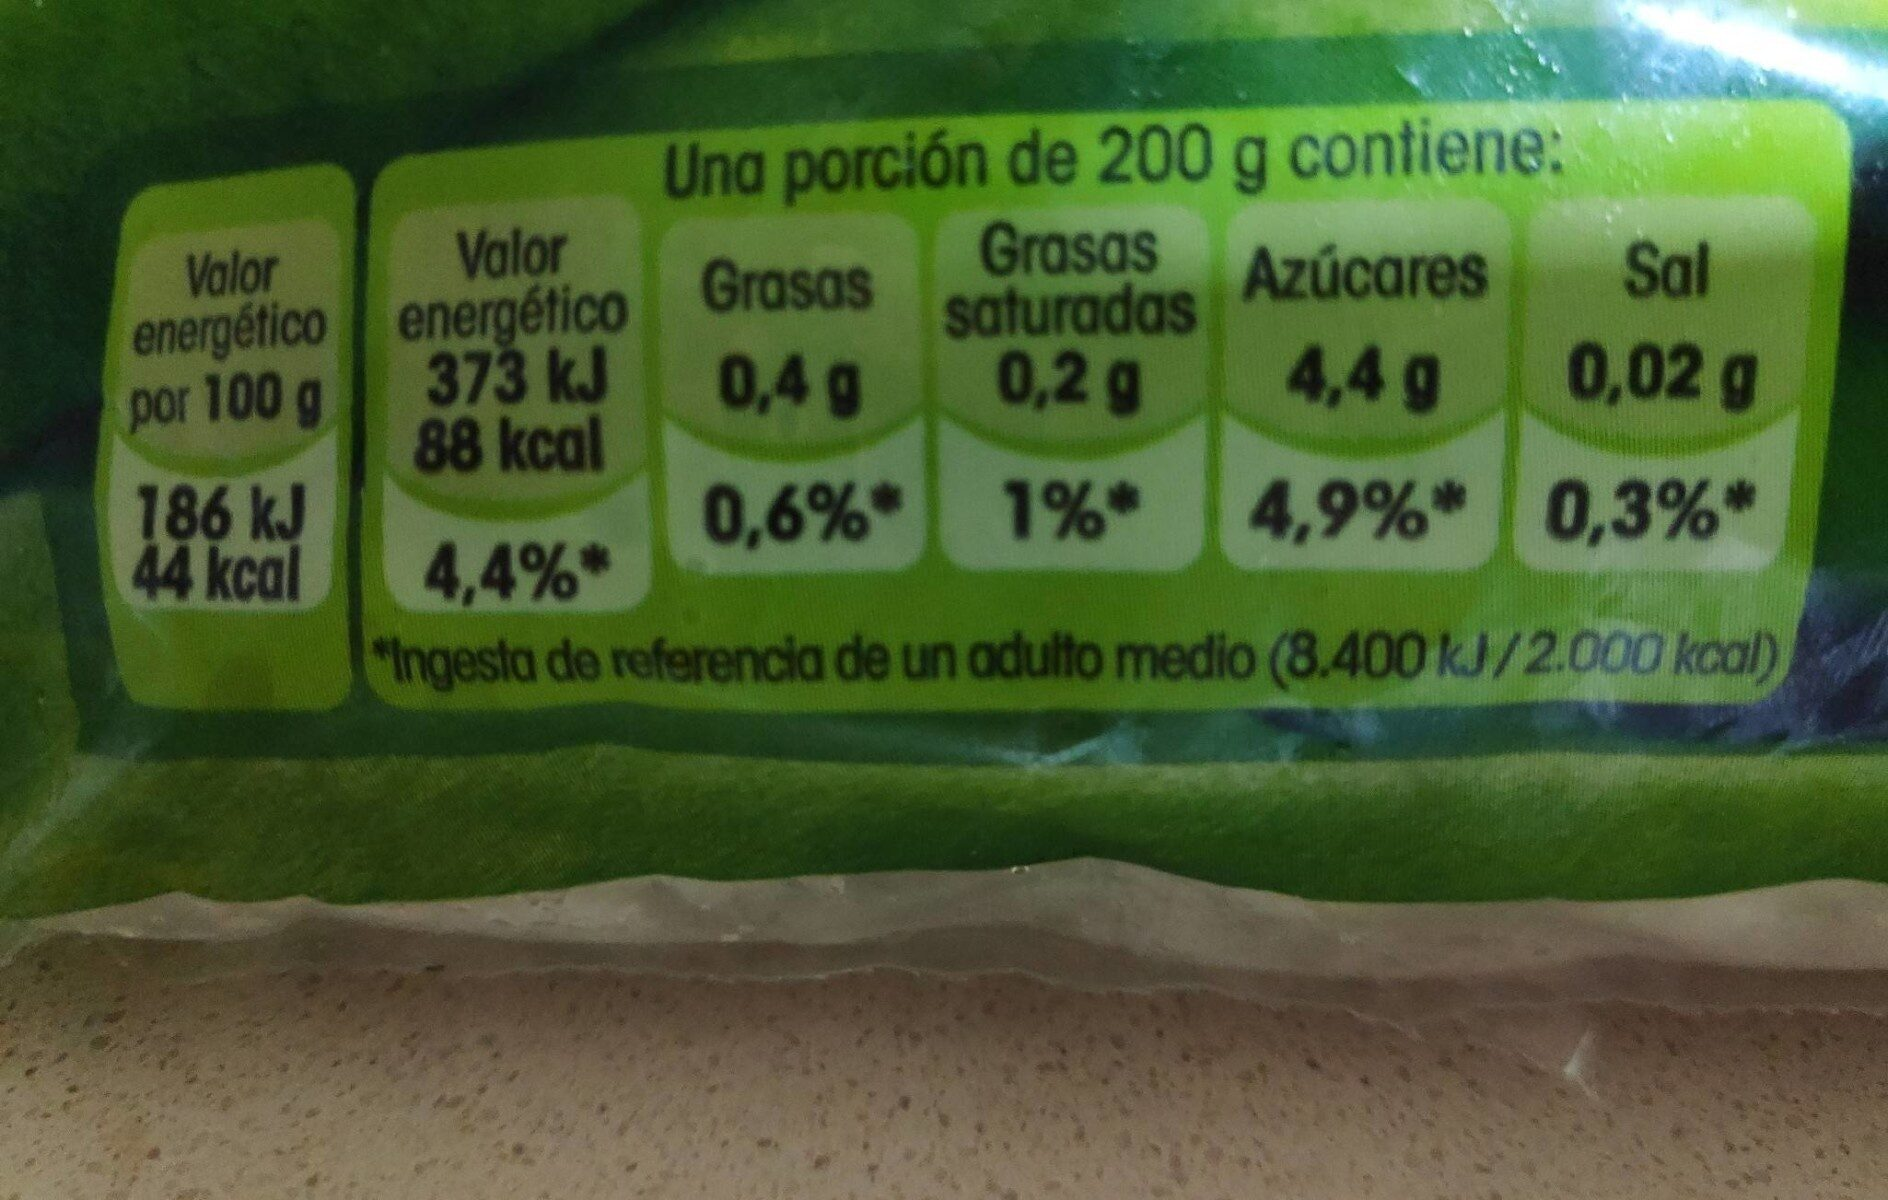 Judías verdes planas - Informations nutritionnelles - es